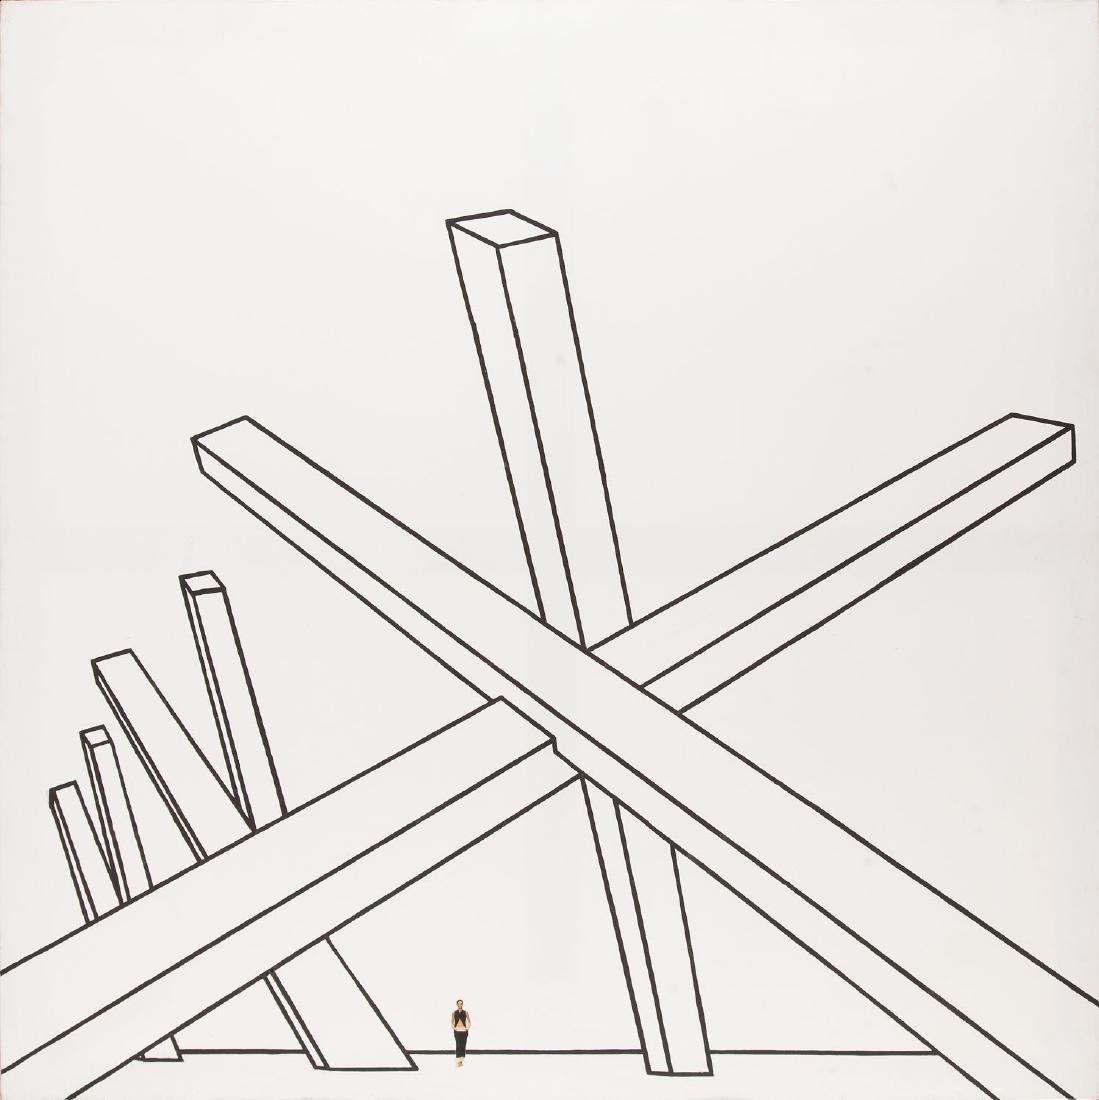 Wilhelm Sasnal (b. 1972) Untitled, 2001